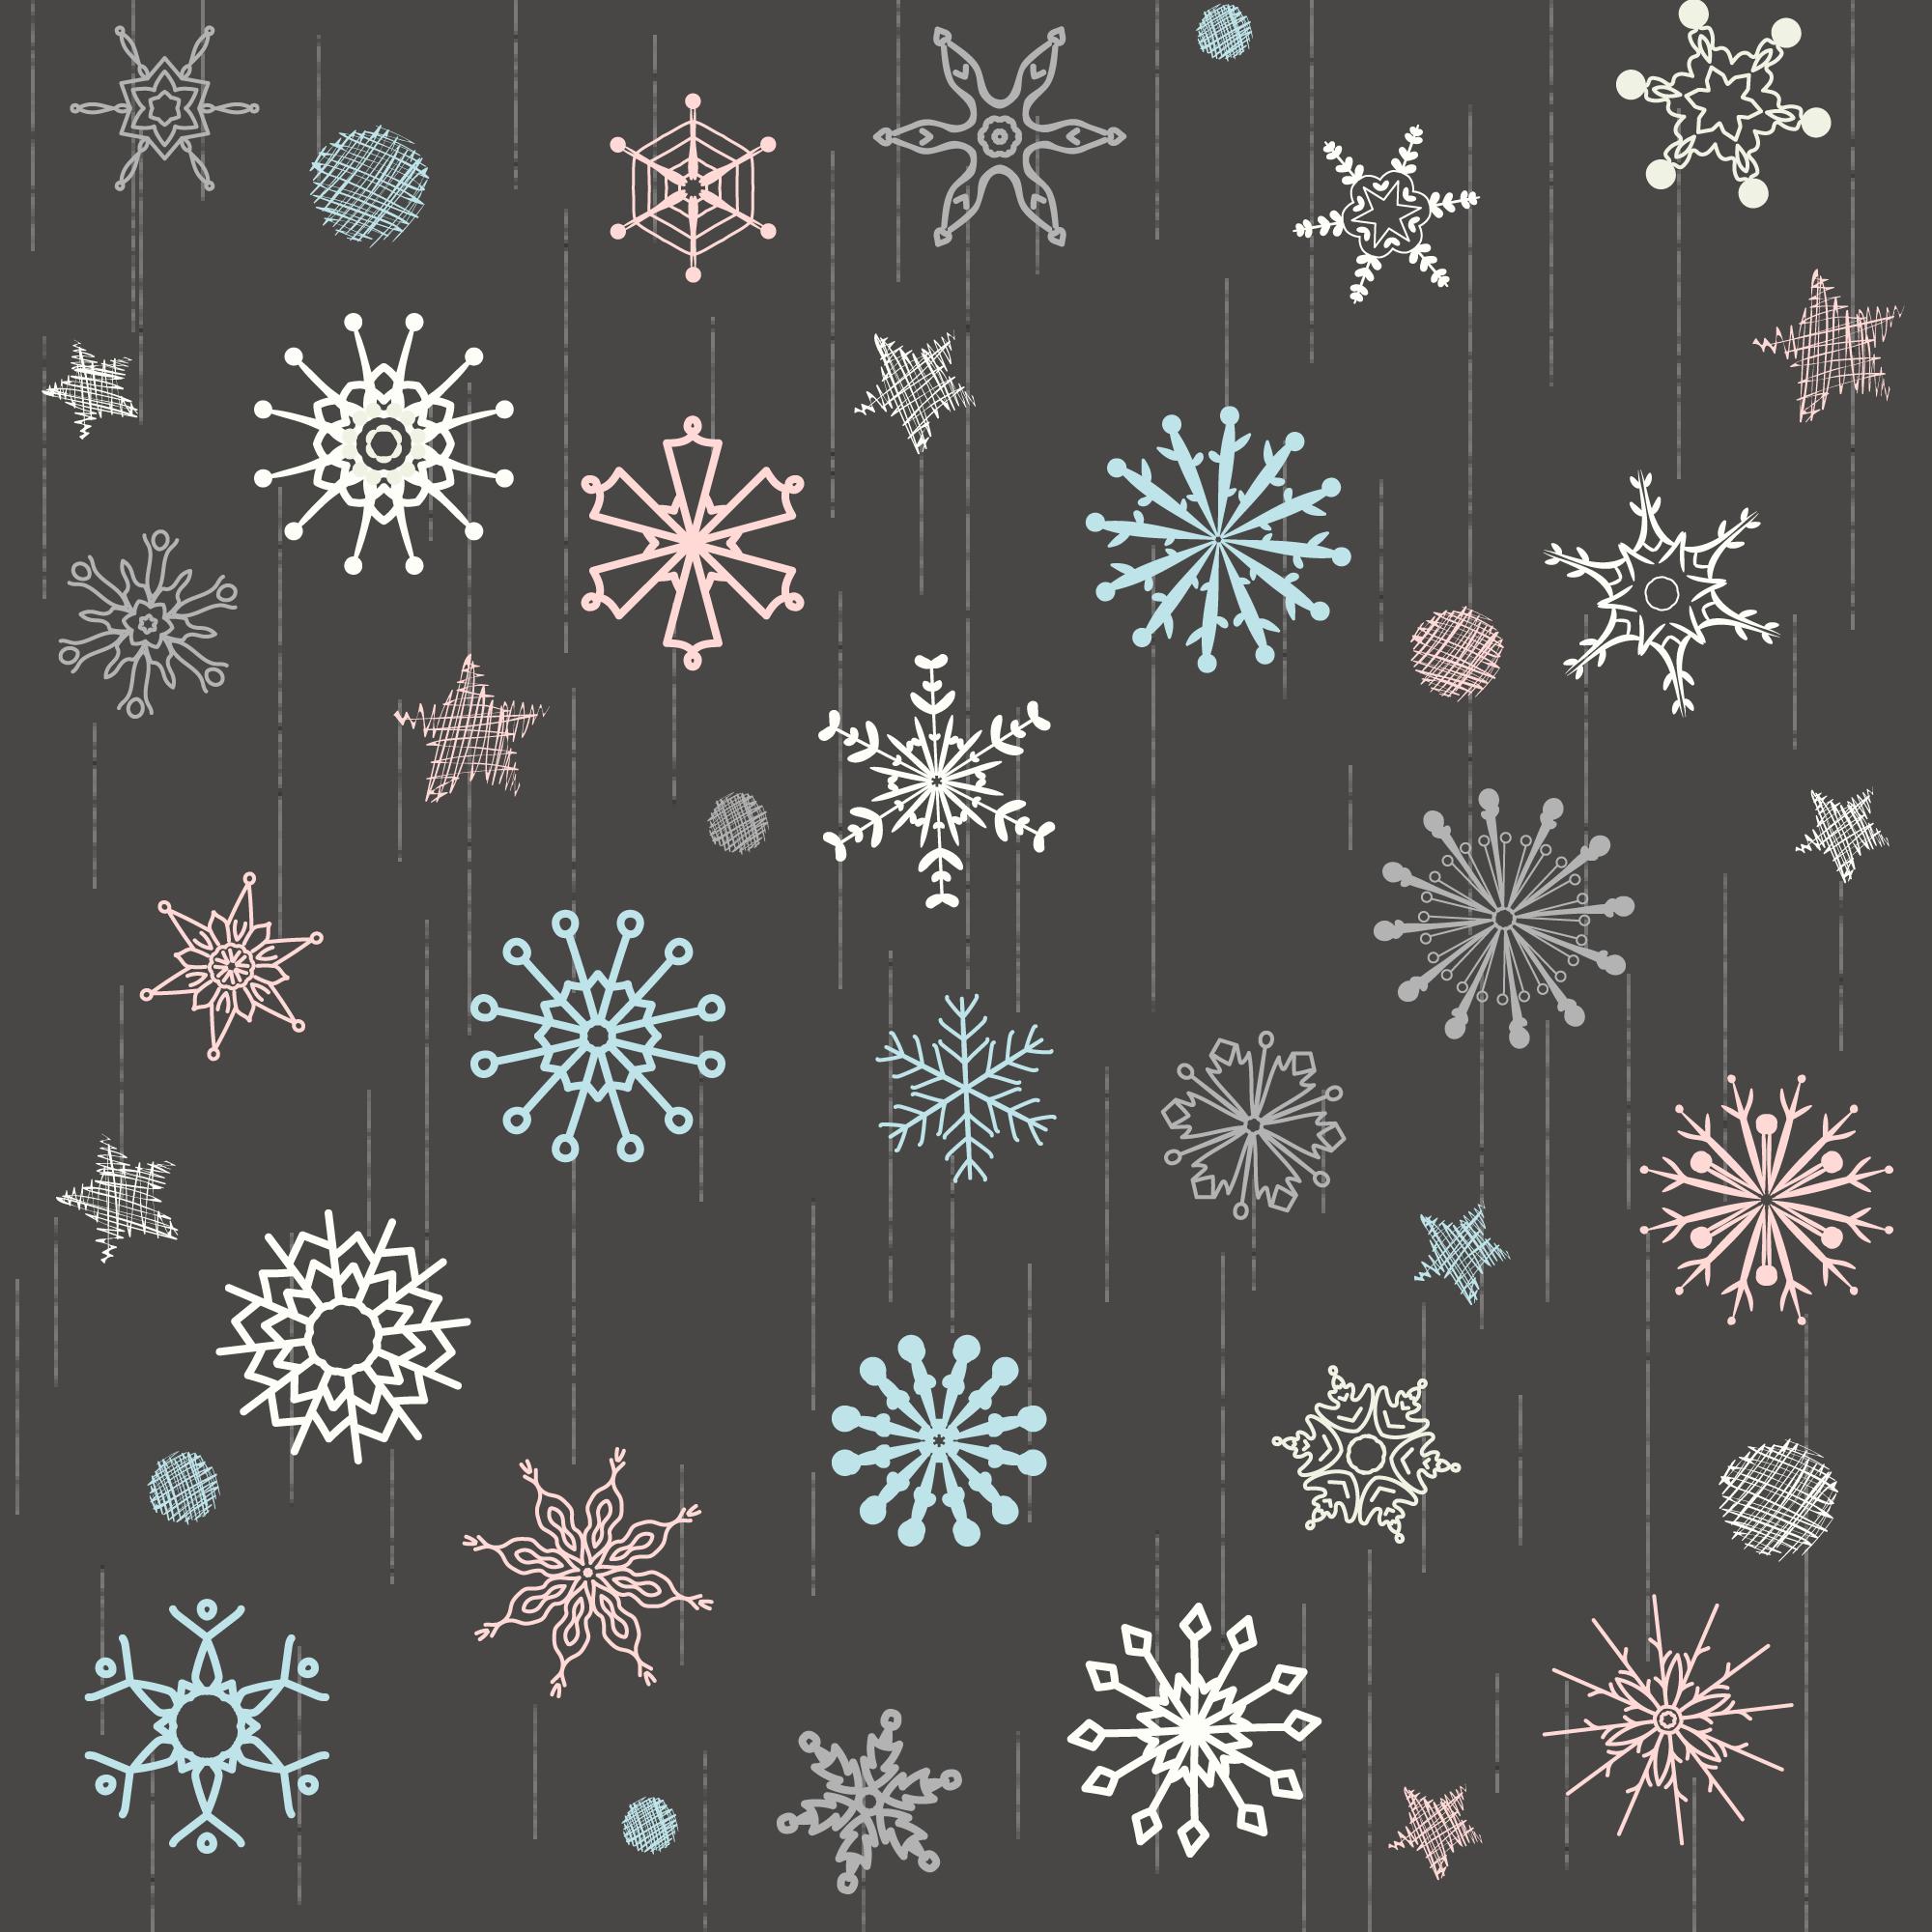 Snowflake Doodle Free Vector Art